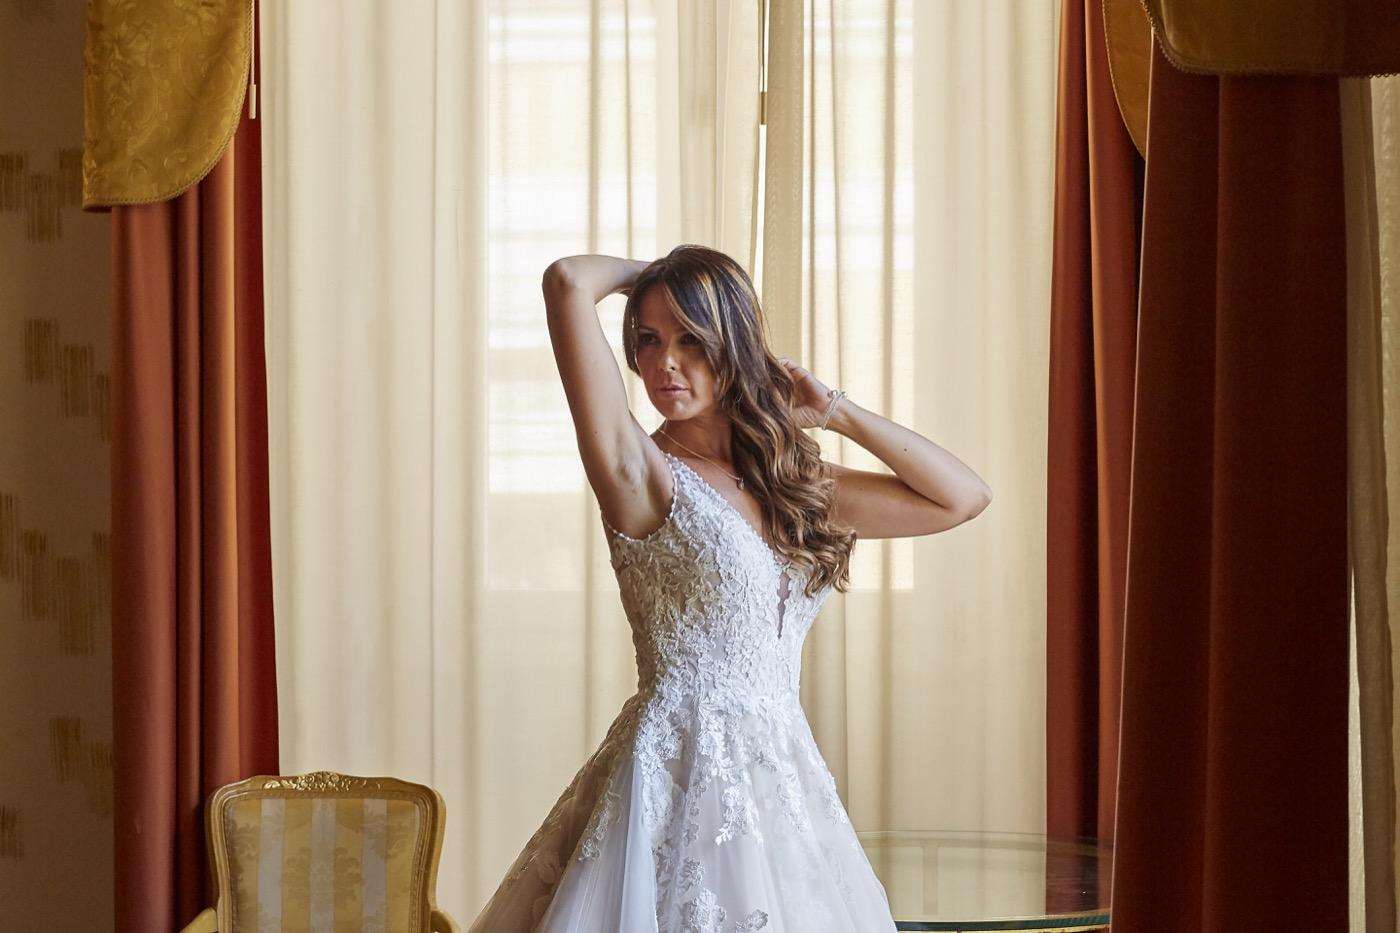 Claudio-Coppola-wedding-photographer-la-scuderia-eventi-preparativi-la-rosetta-perugia-29